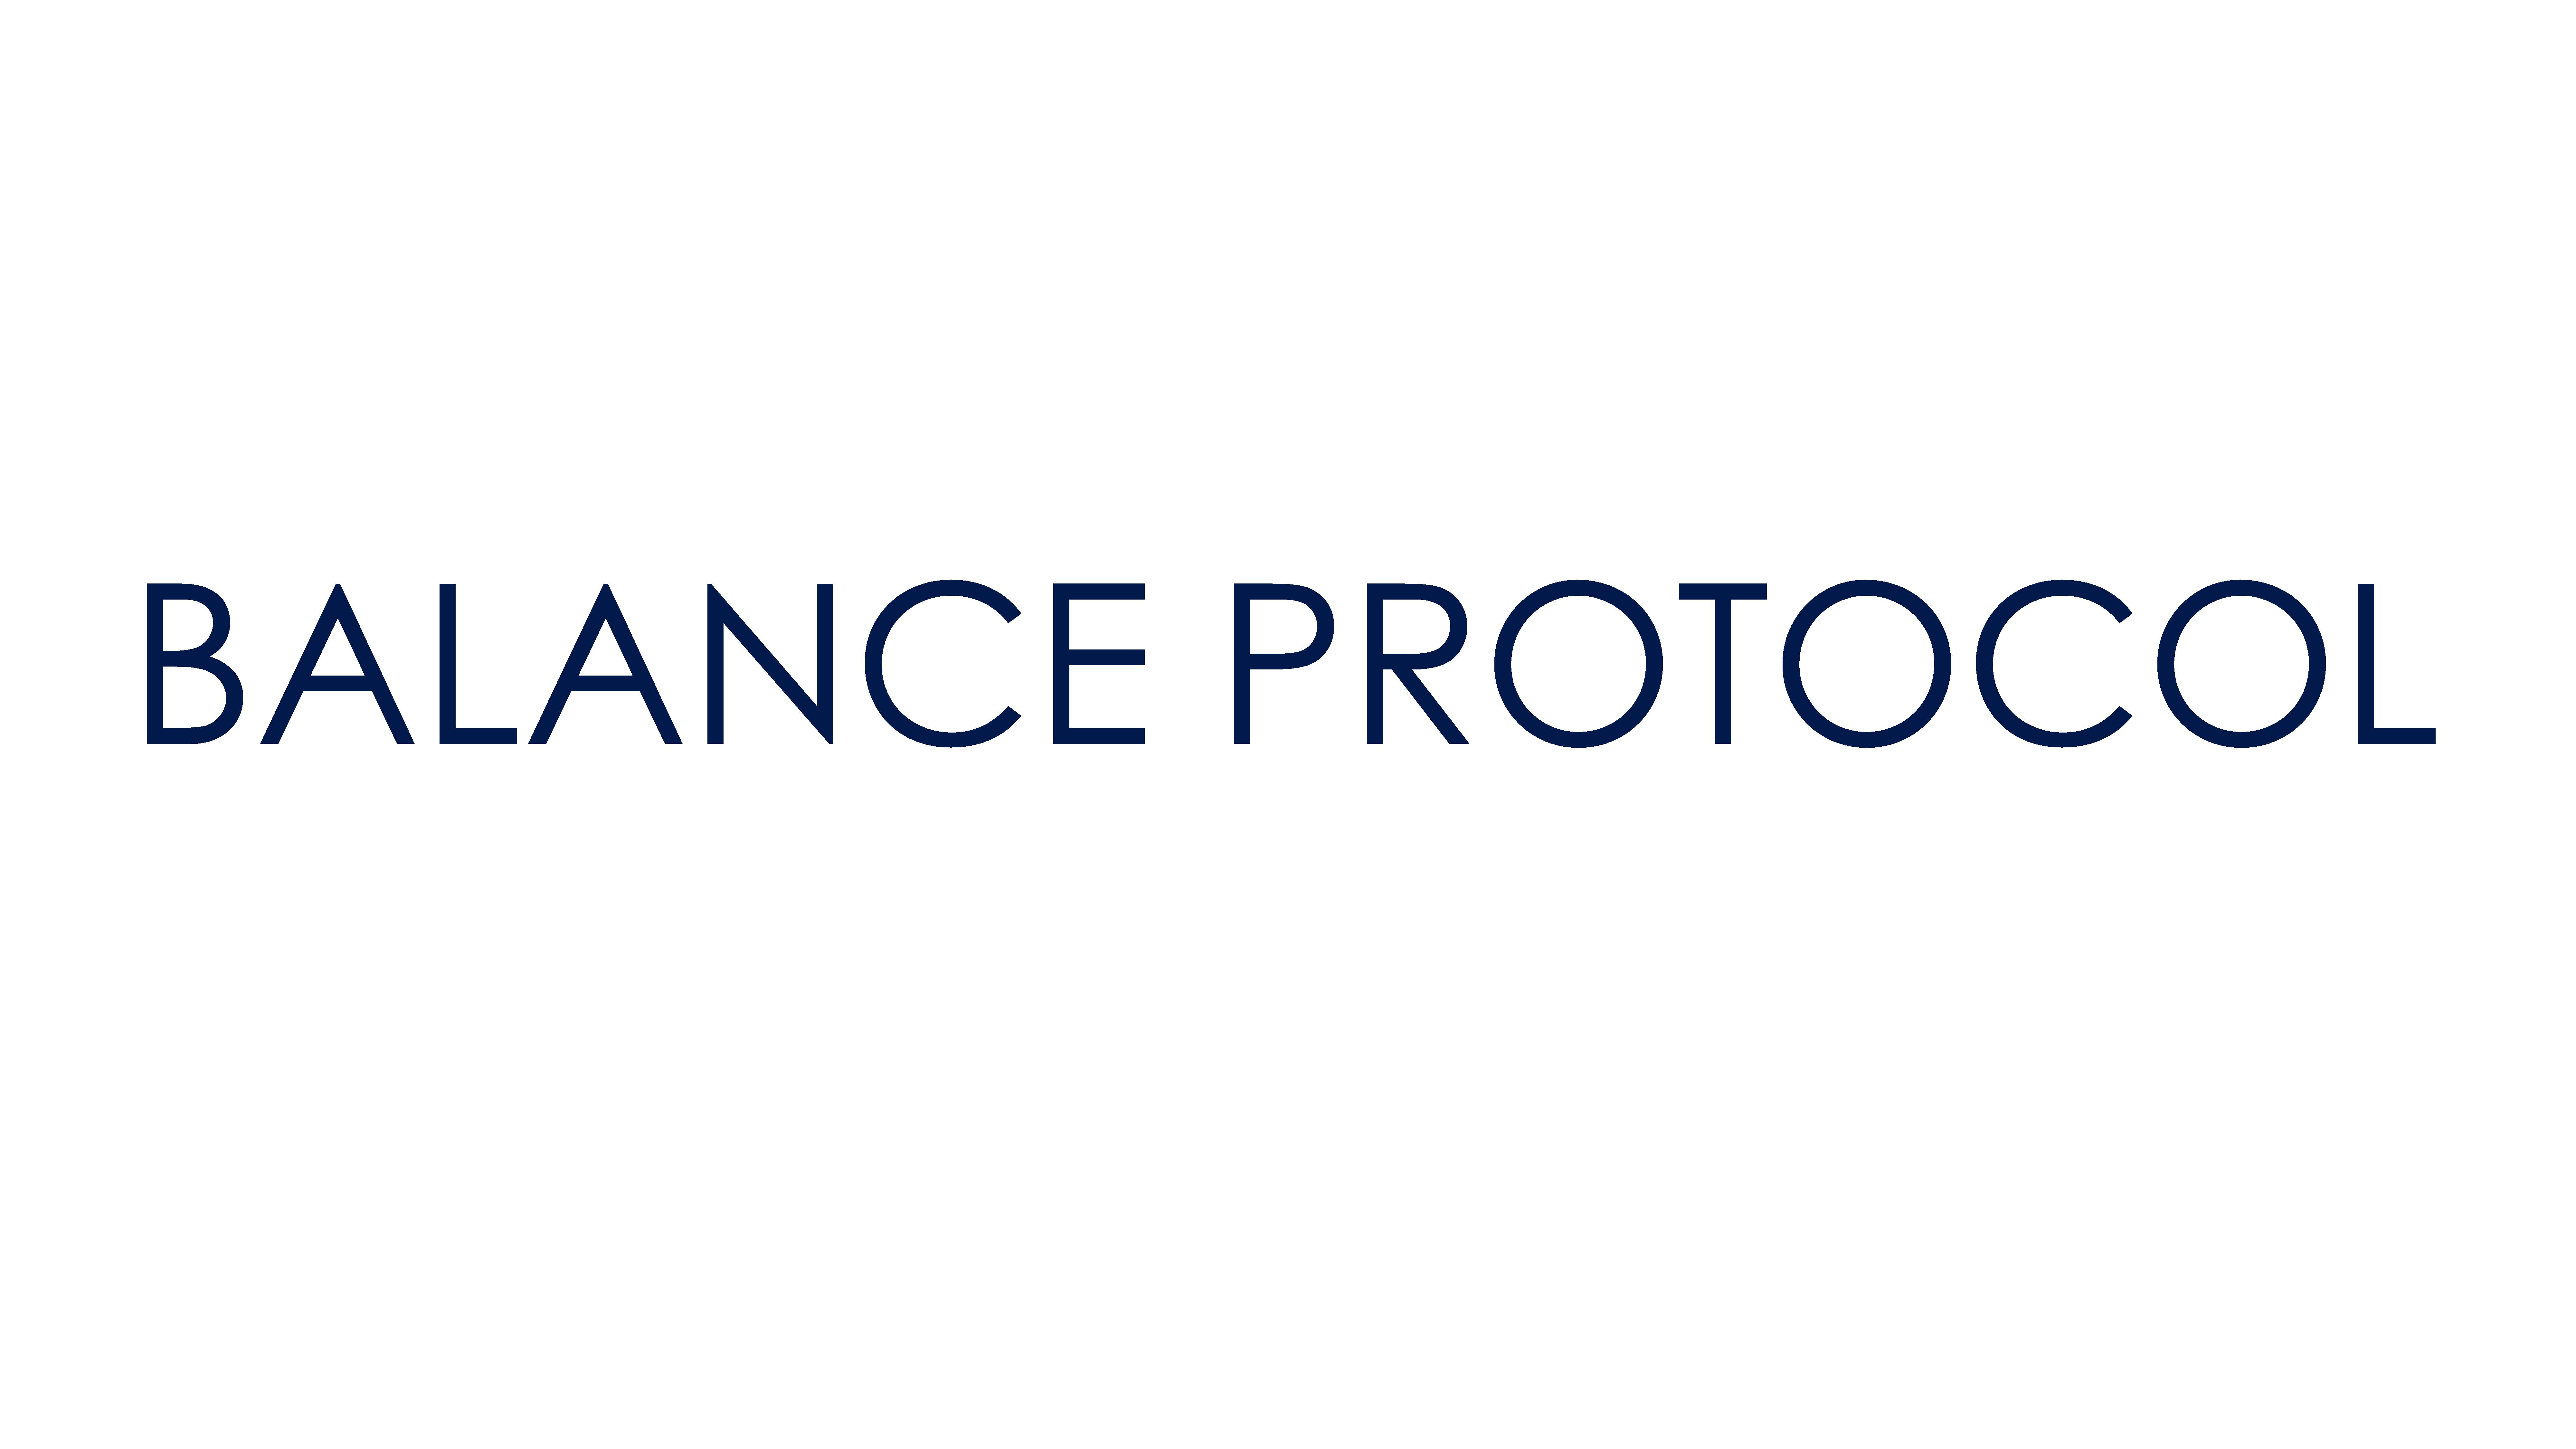 Balance Protocol